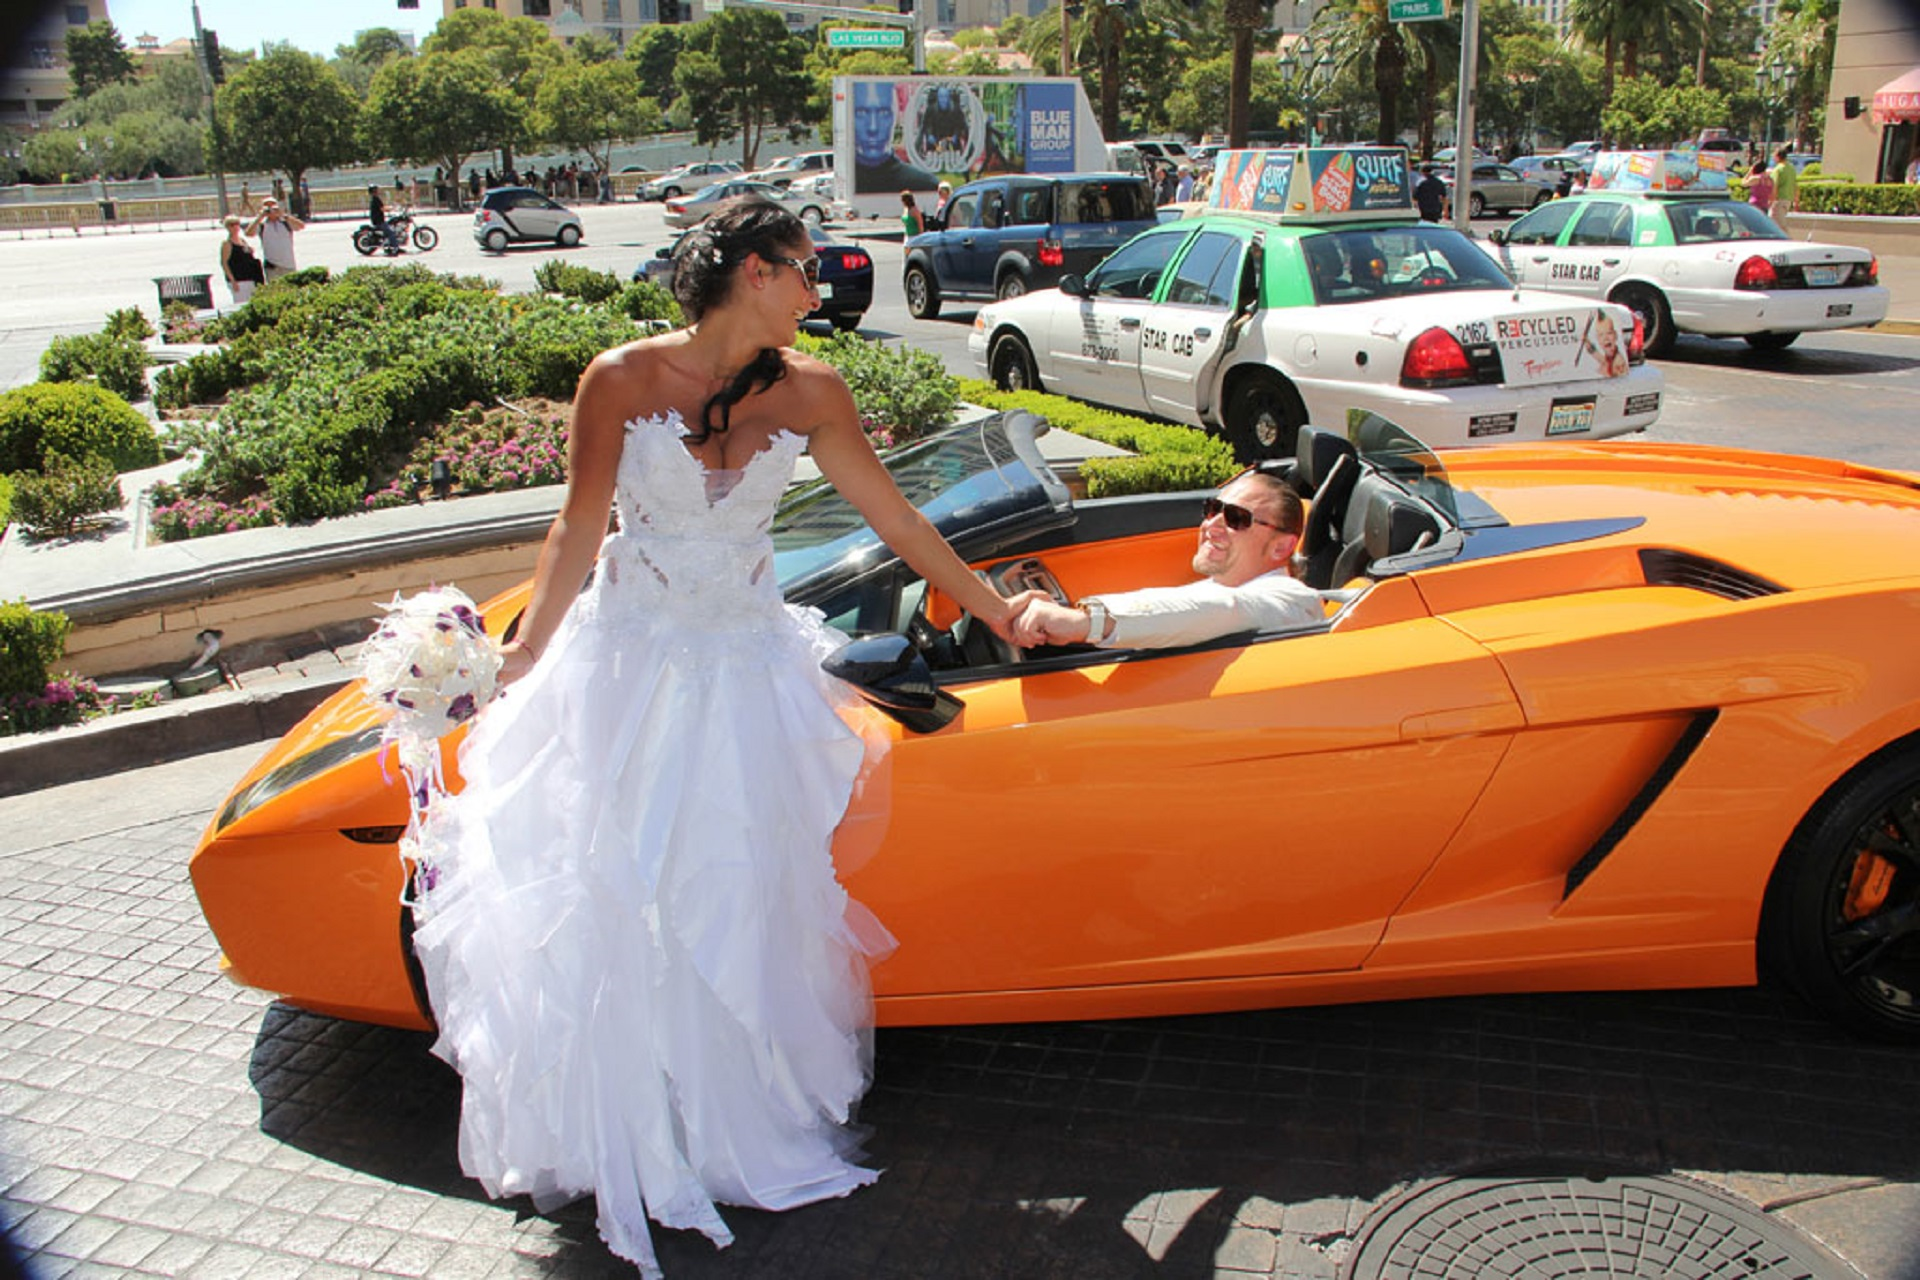 exotic-car-photo-5